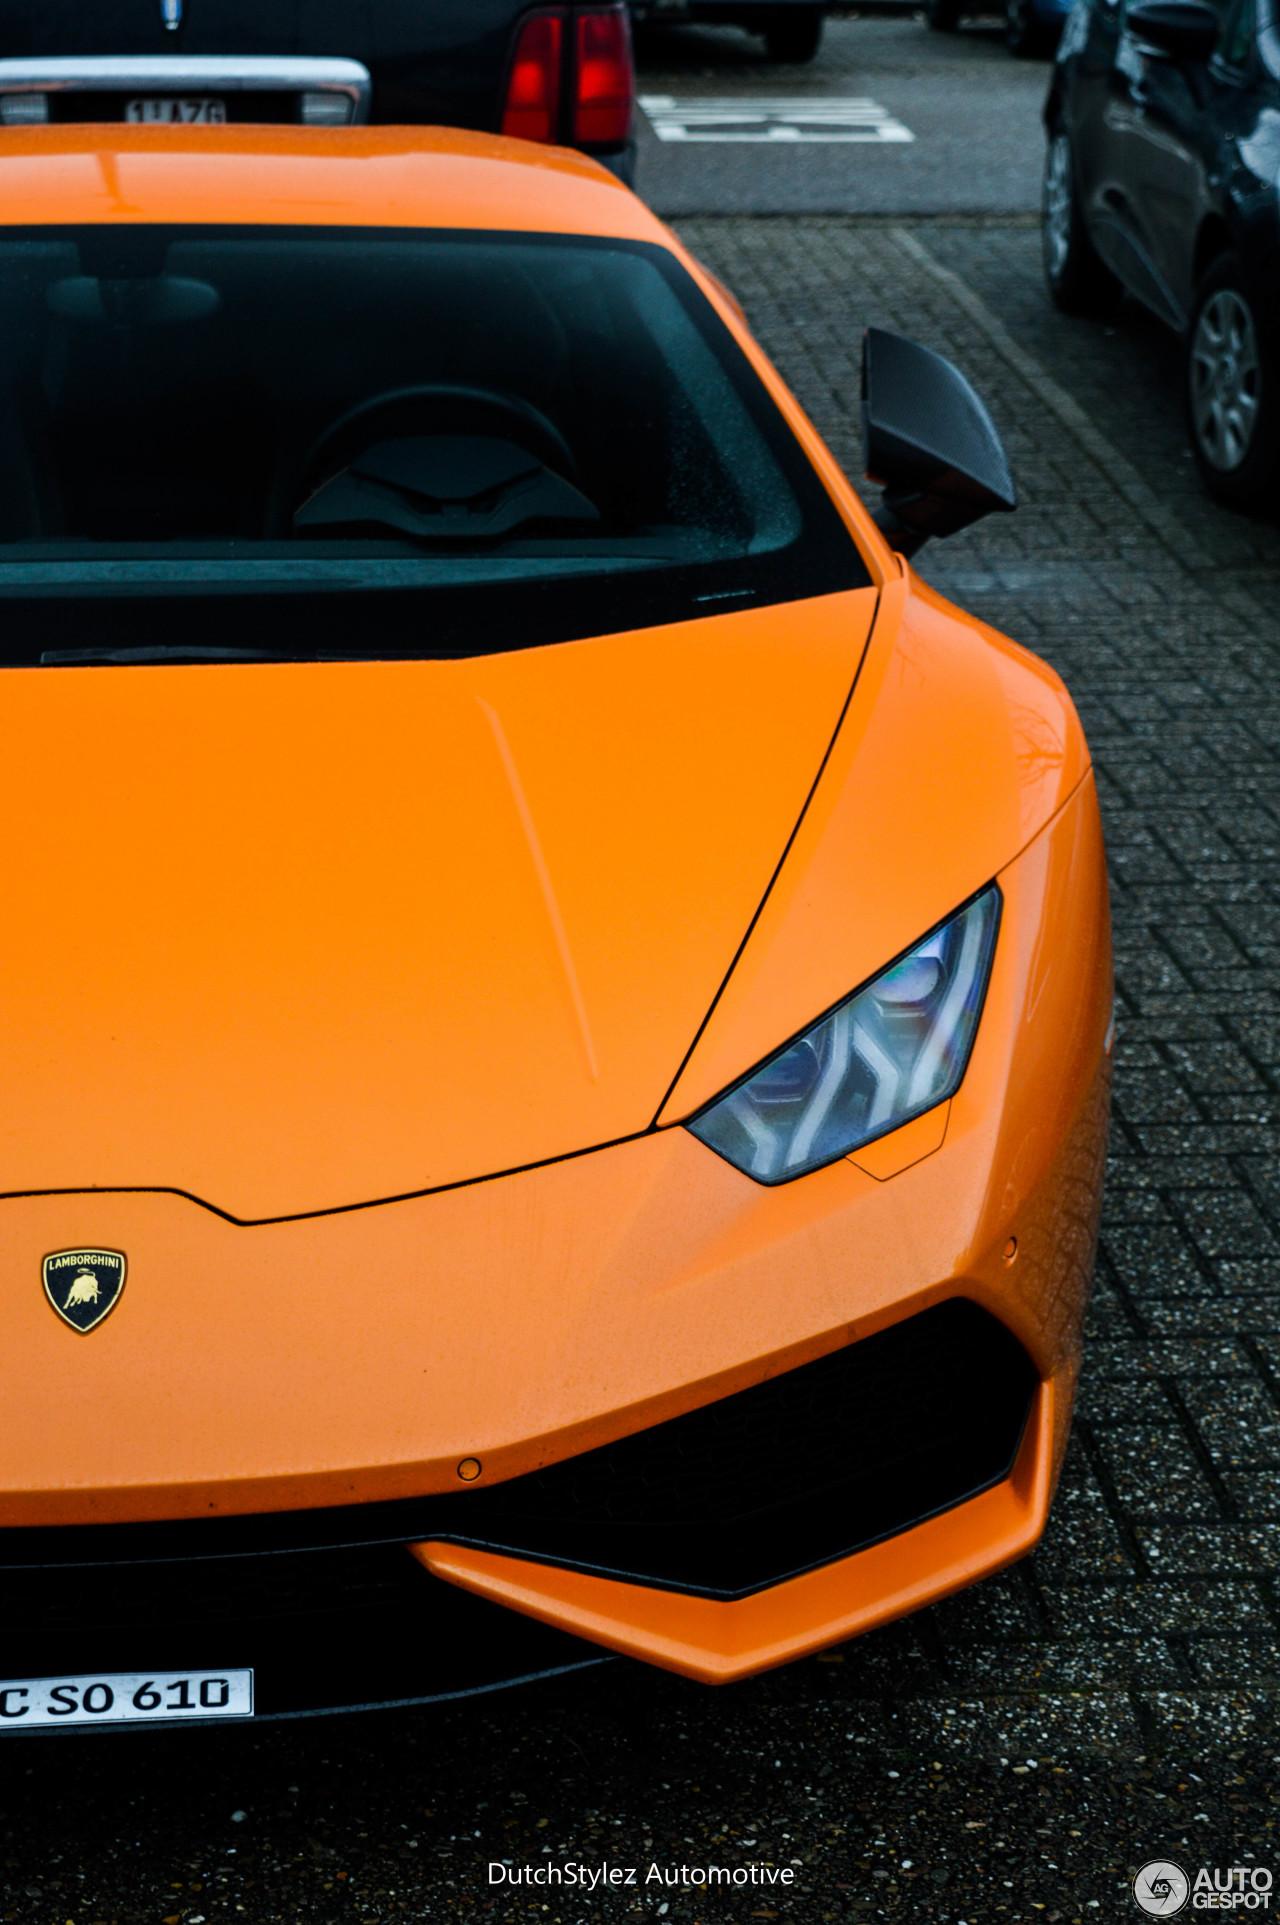 lamborghini-huracan-lp610-4-by-dmc-c916316012017202655_4 Mesmerizing Lamborghini Huracan Price In south Africa Cars Trend